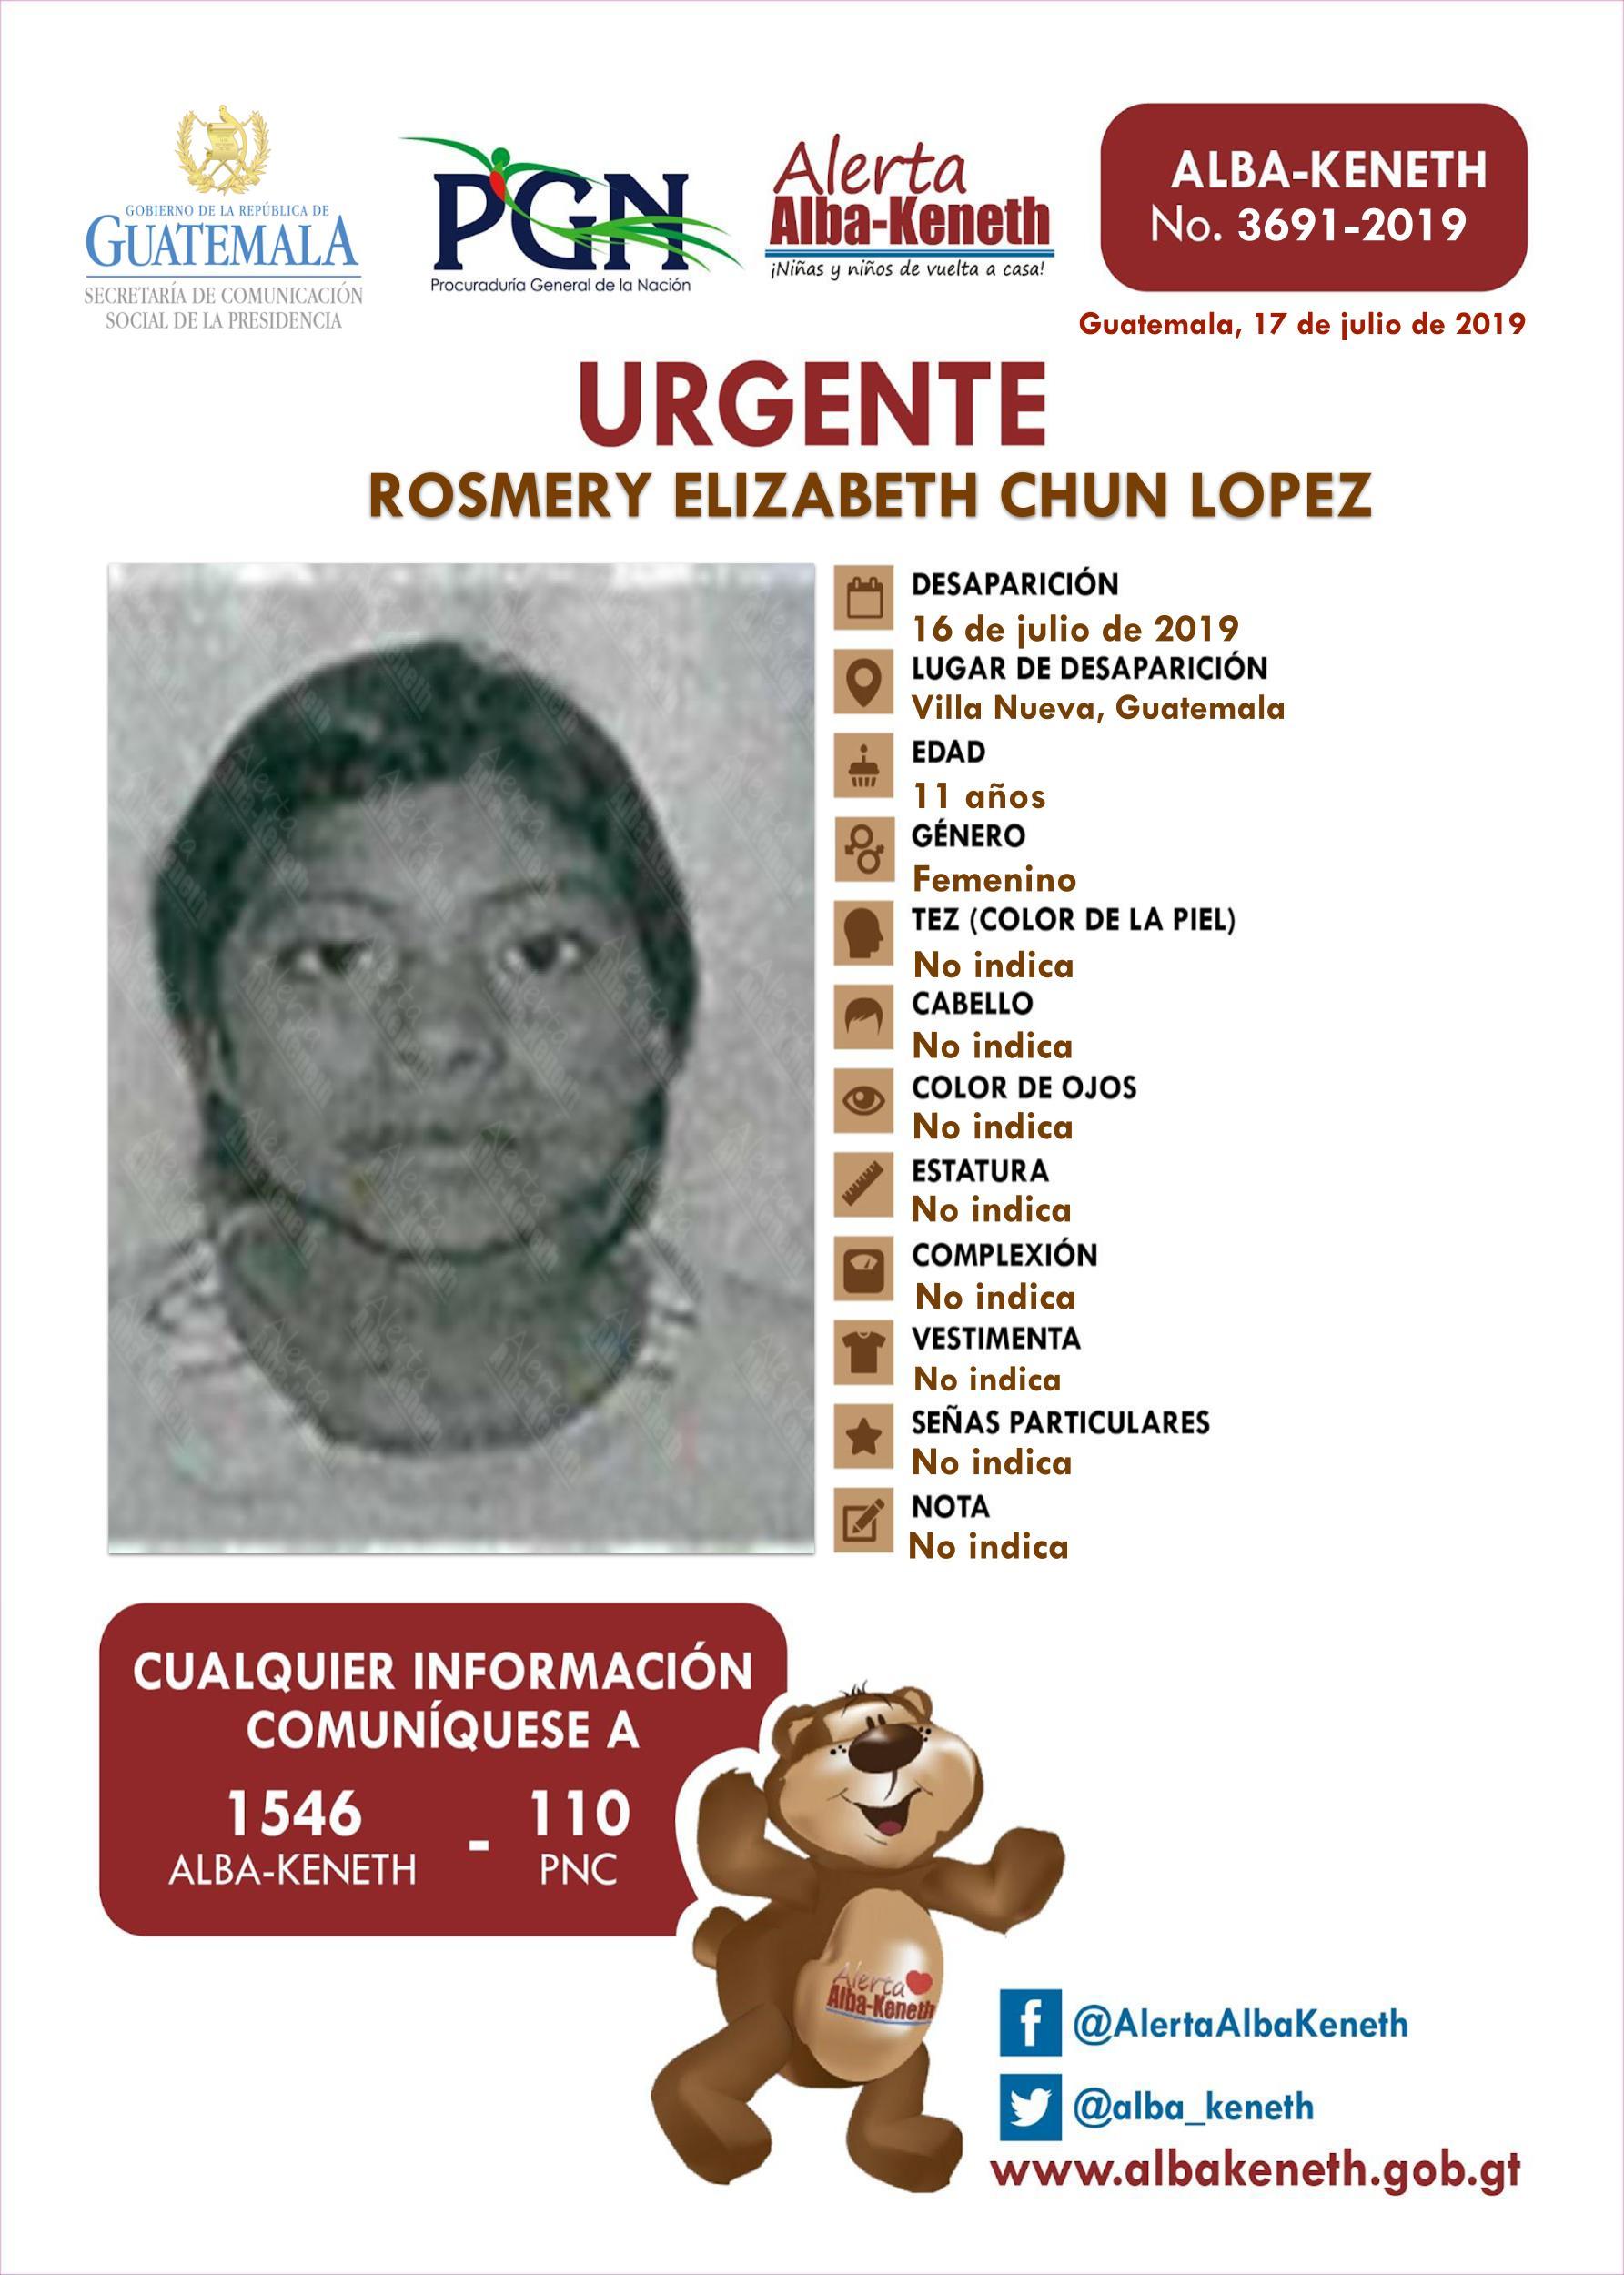 Rosmery Elizabeth Chun Lopez